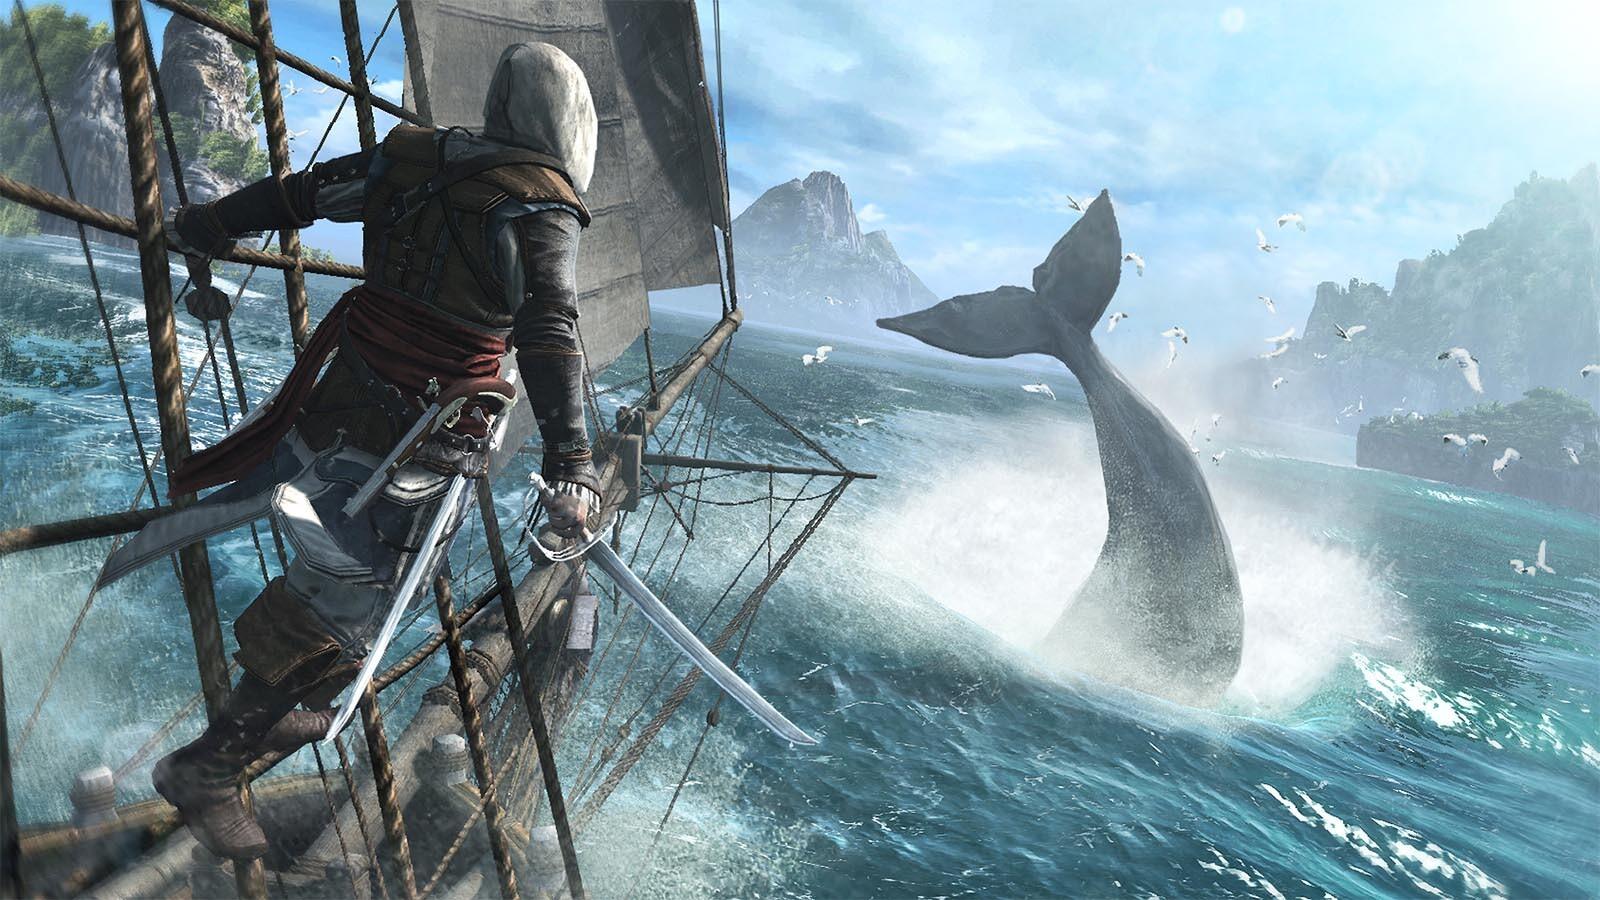 ... Screenshot3 - Assassin's Creed IV Black Flag ...